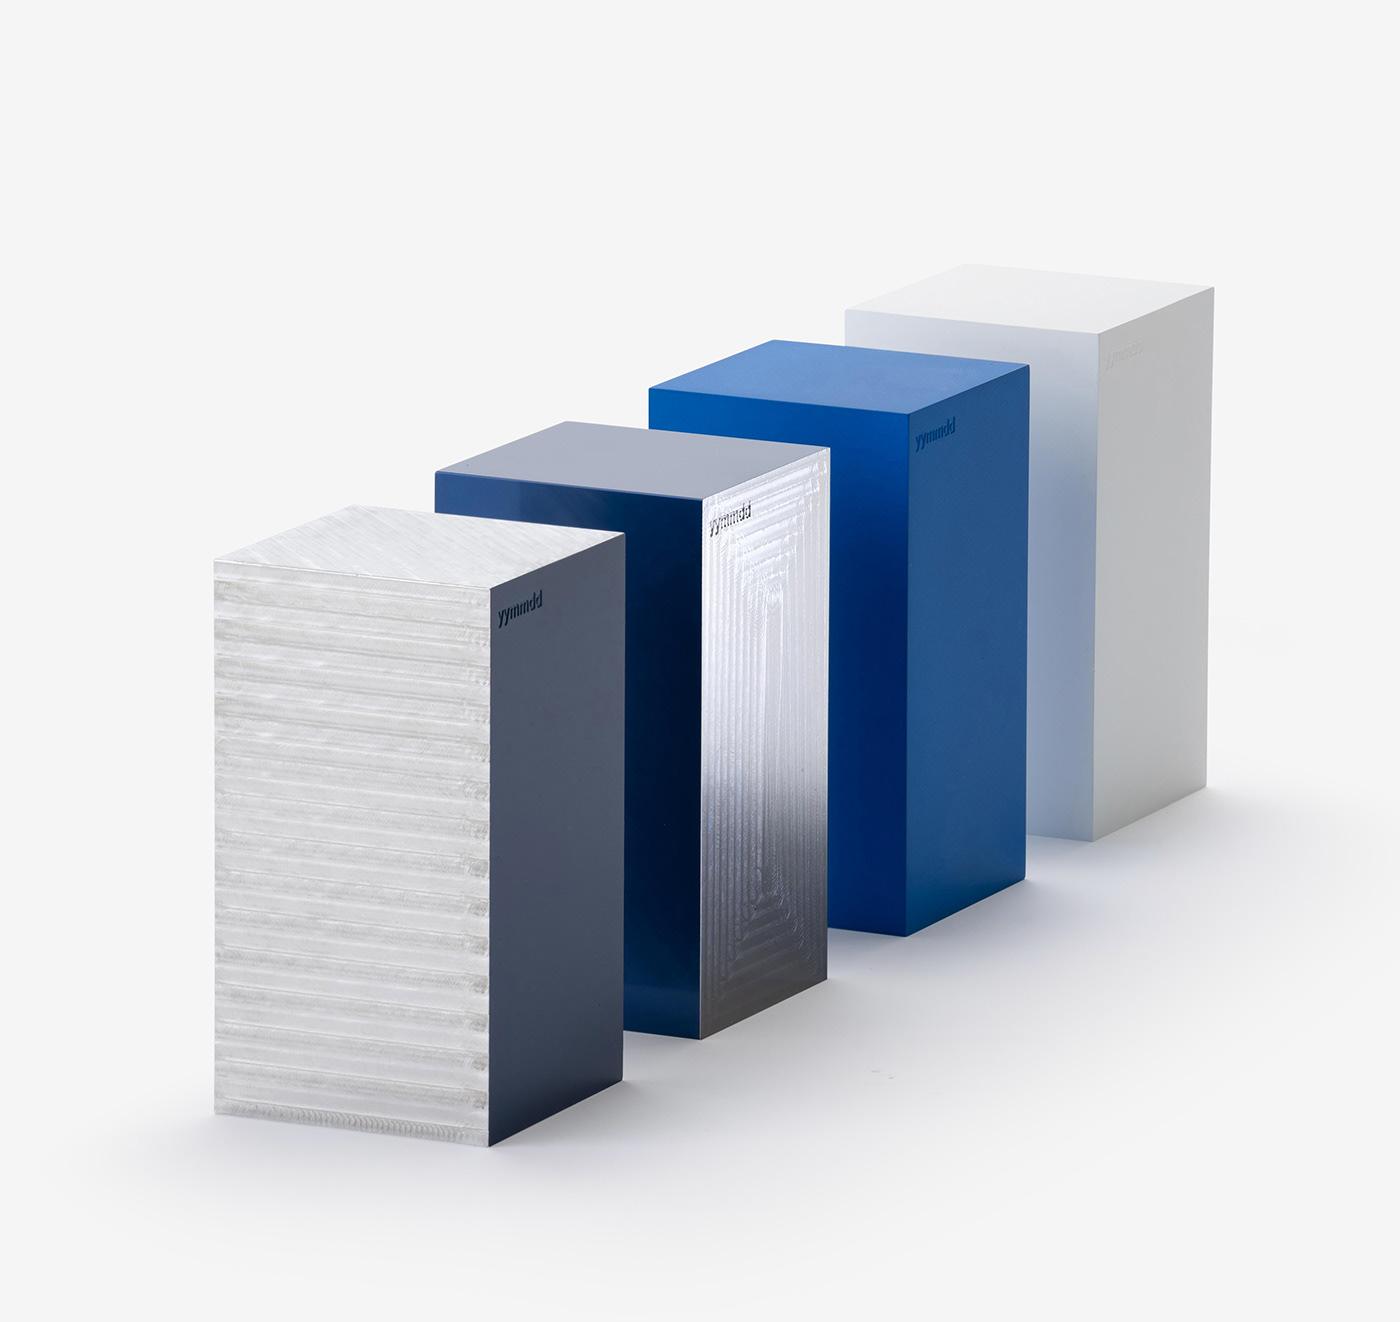 business card Design Award design studio industrial design  inspiration product design  yymmdd yymmdd studio 산업디자인 제품디자인